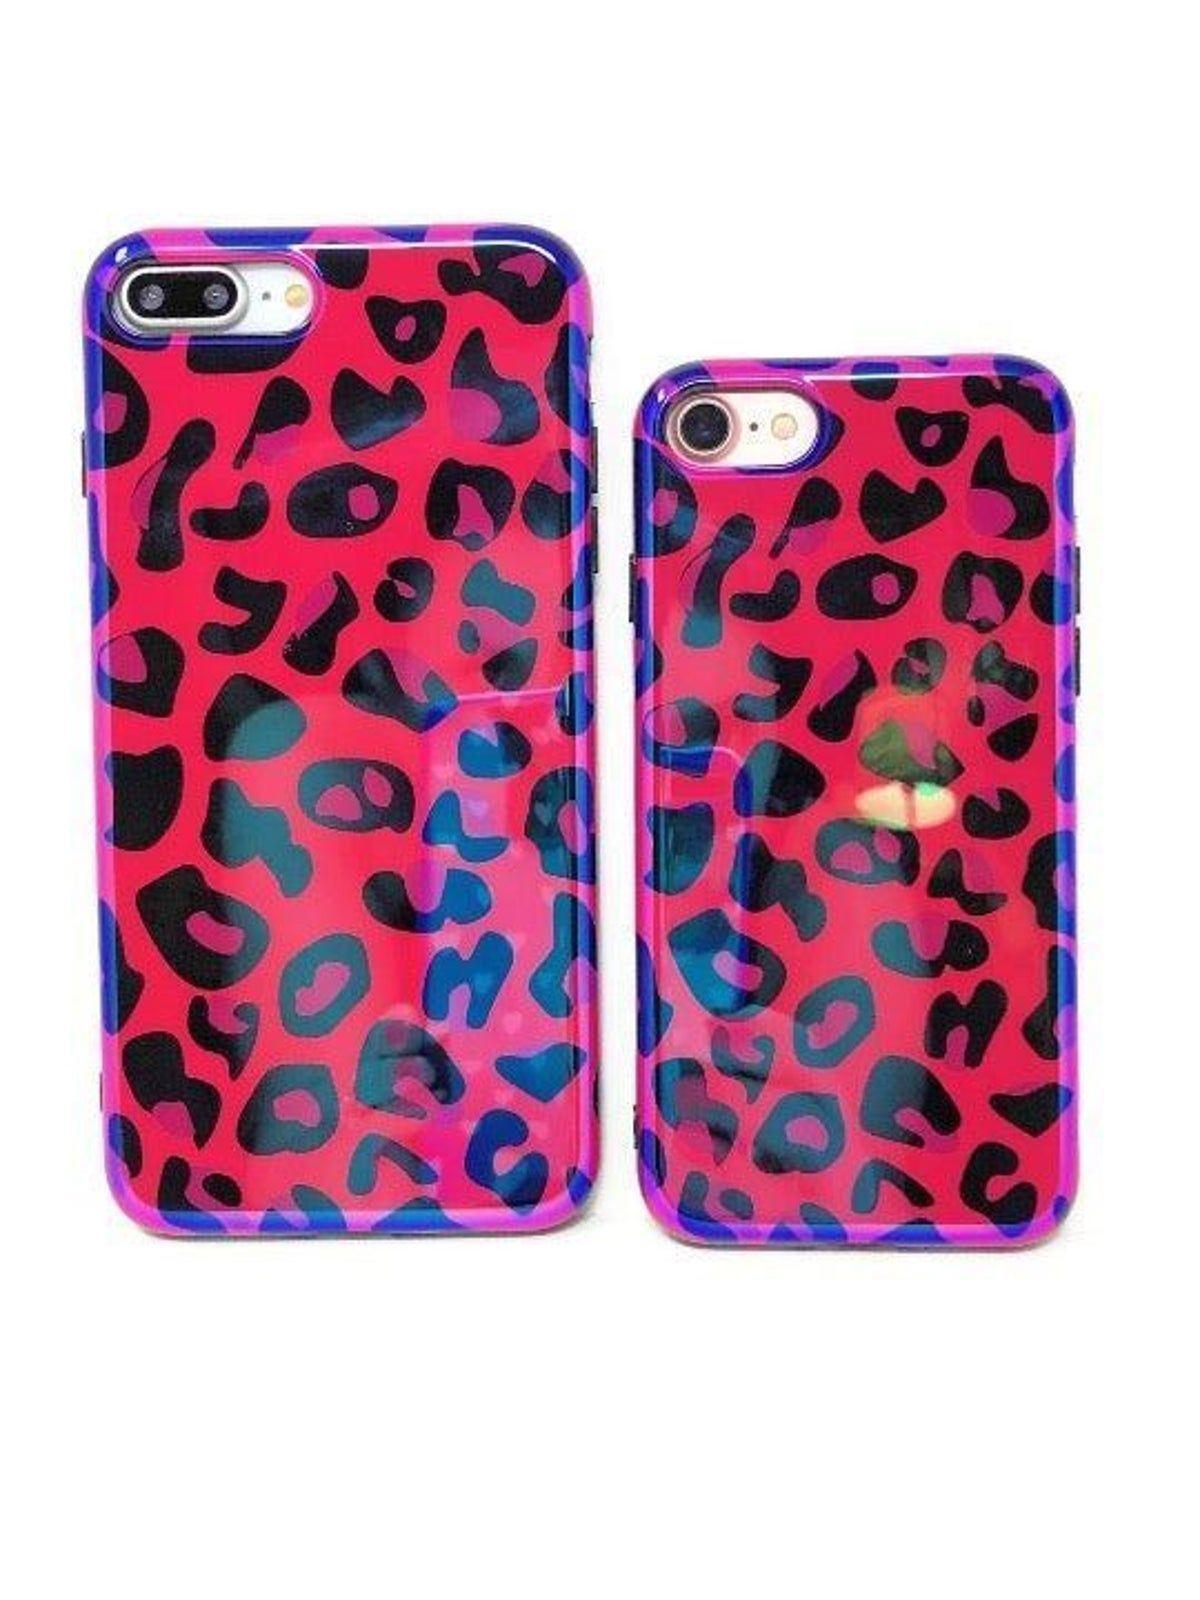 NEW iPhone XS Max Blu-Ray Leopard Case